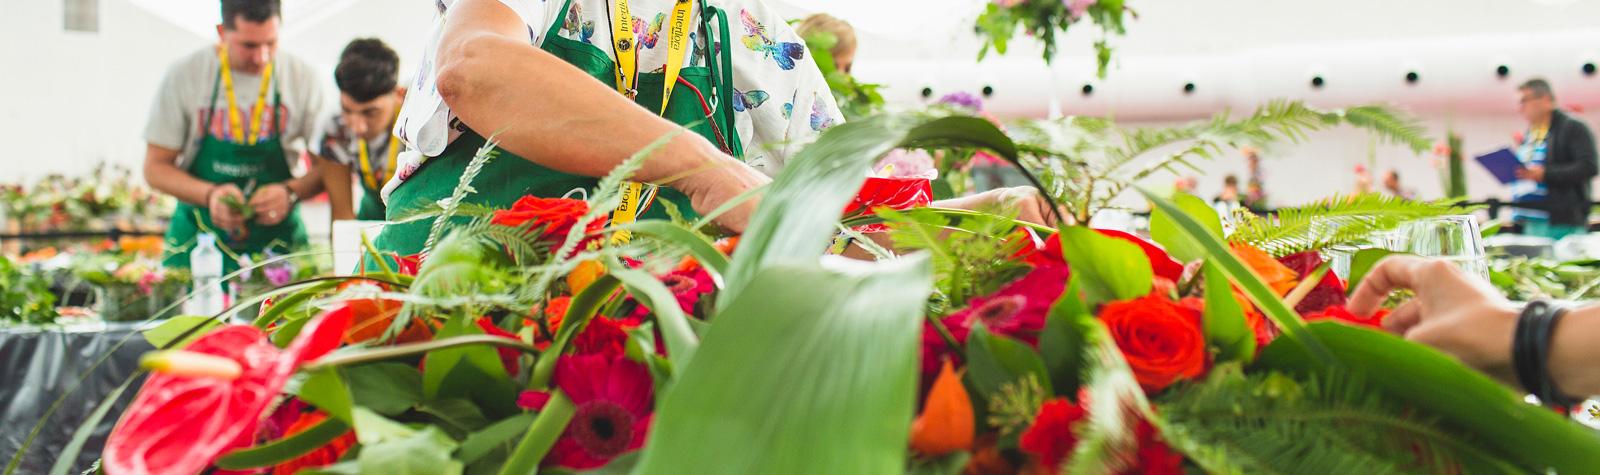 Ser florista. Sefa Tur, ganadora del MAF 2015